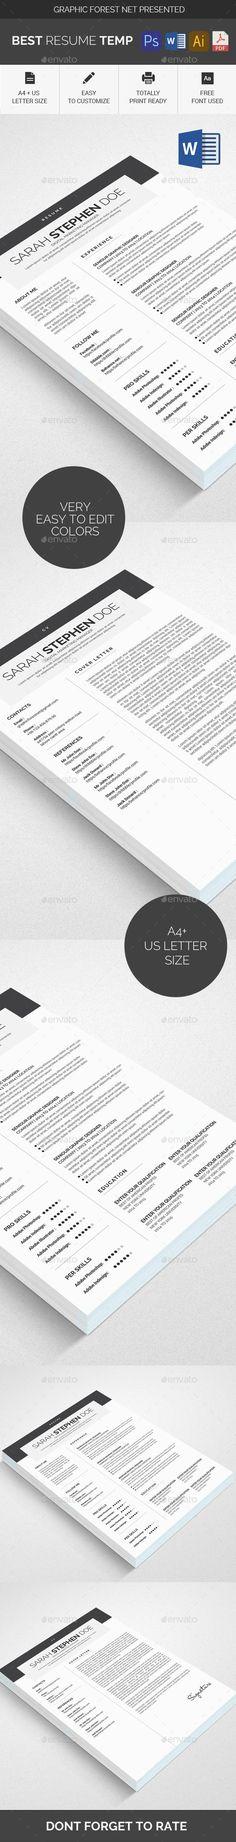 Resume Word - Resumes Stationery Resume Templates Pinterest